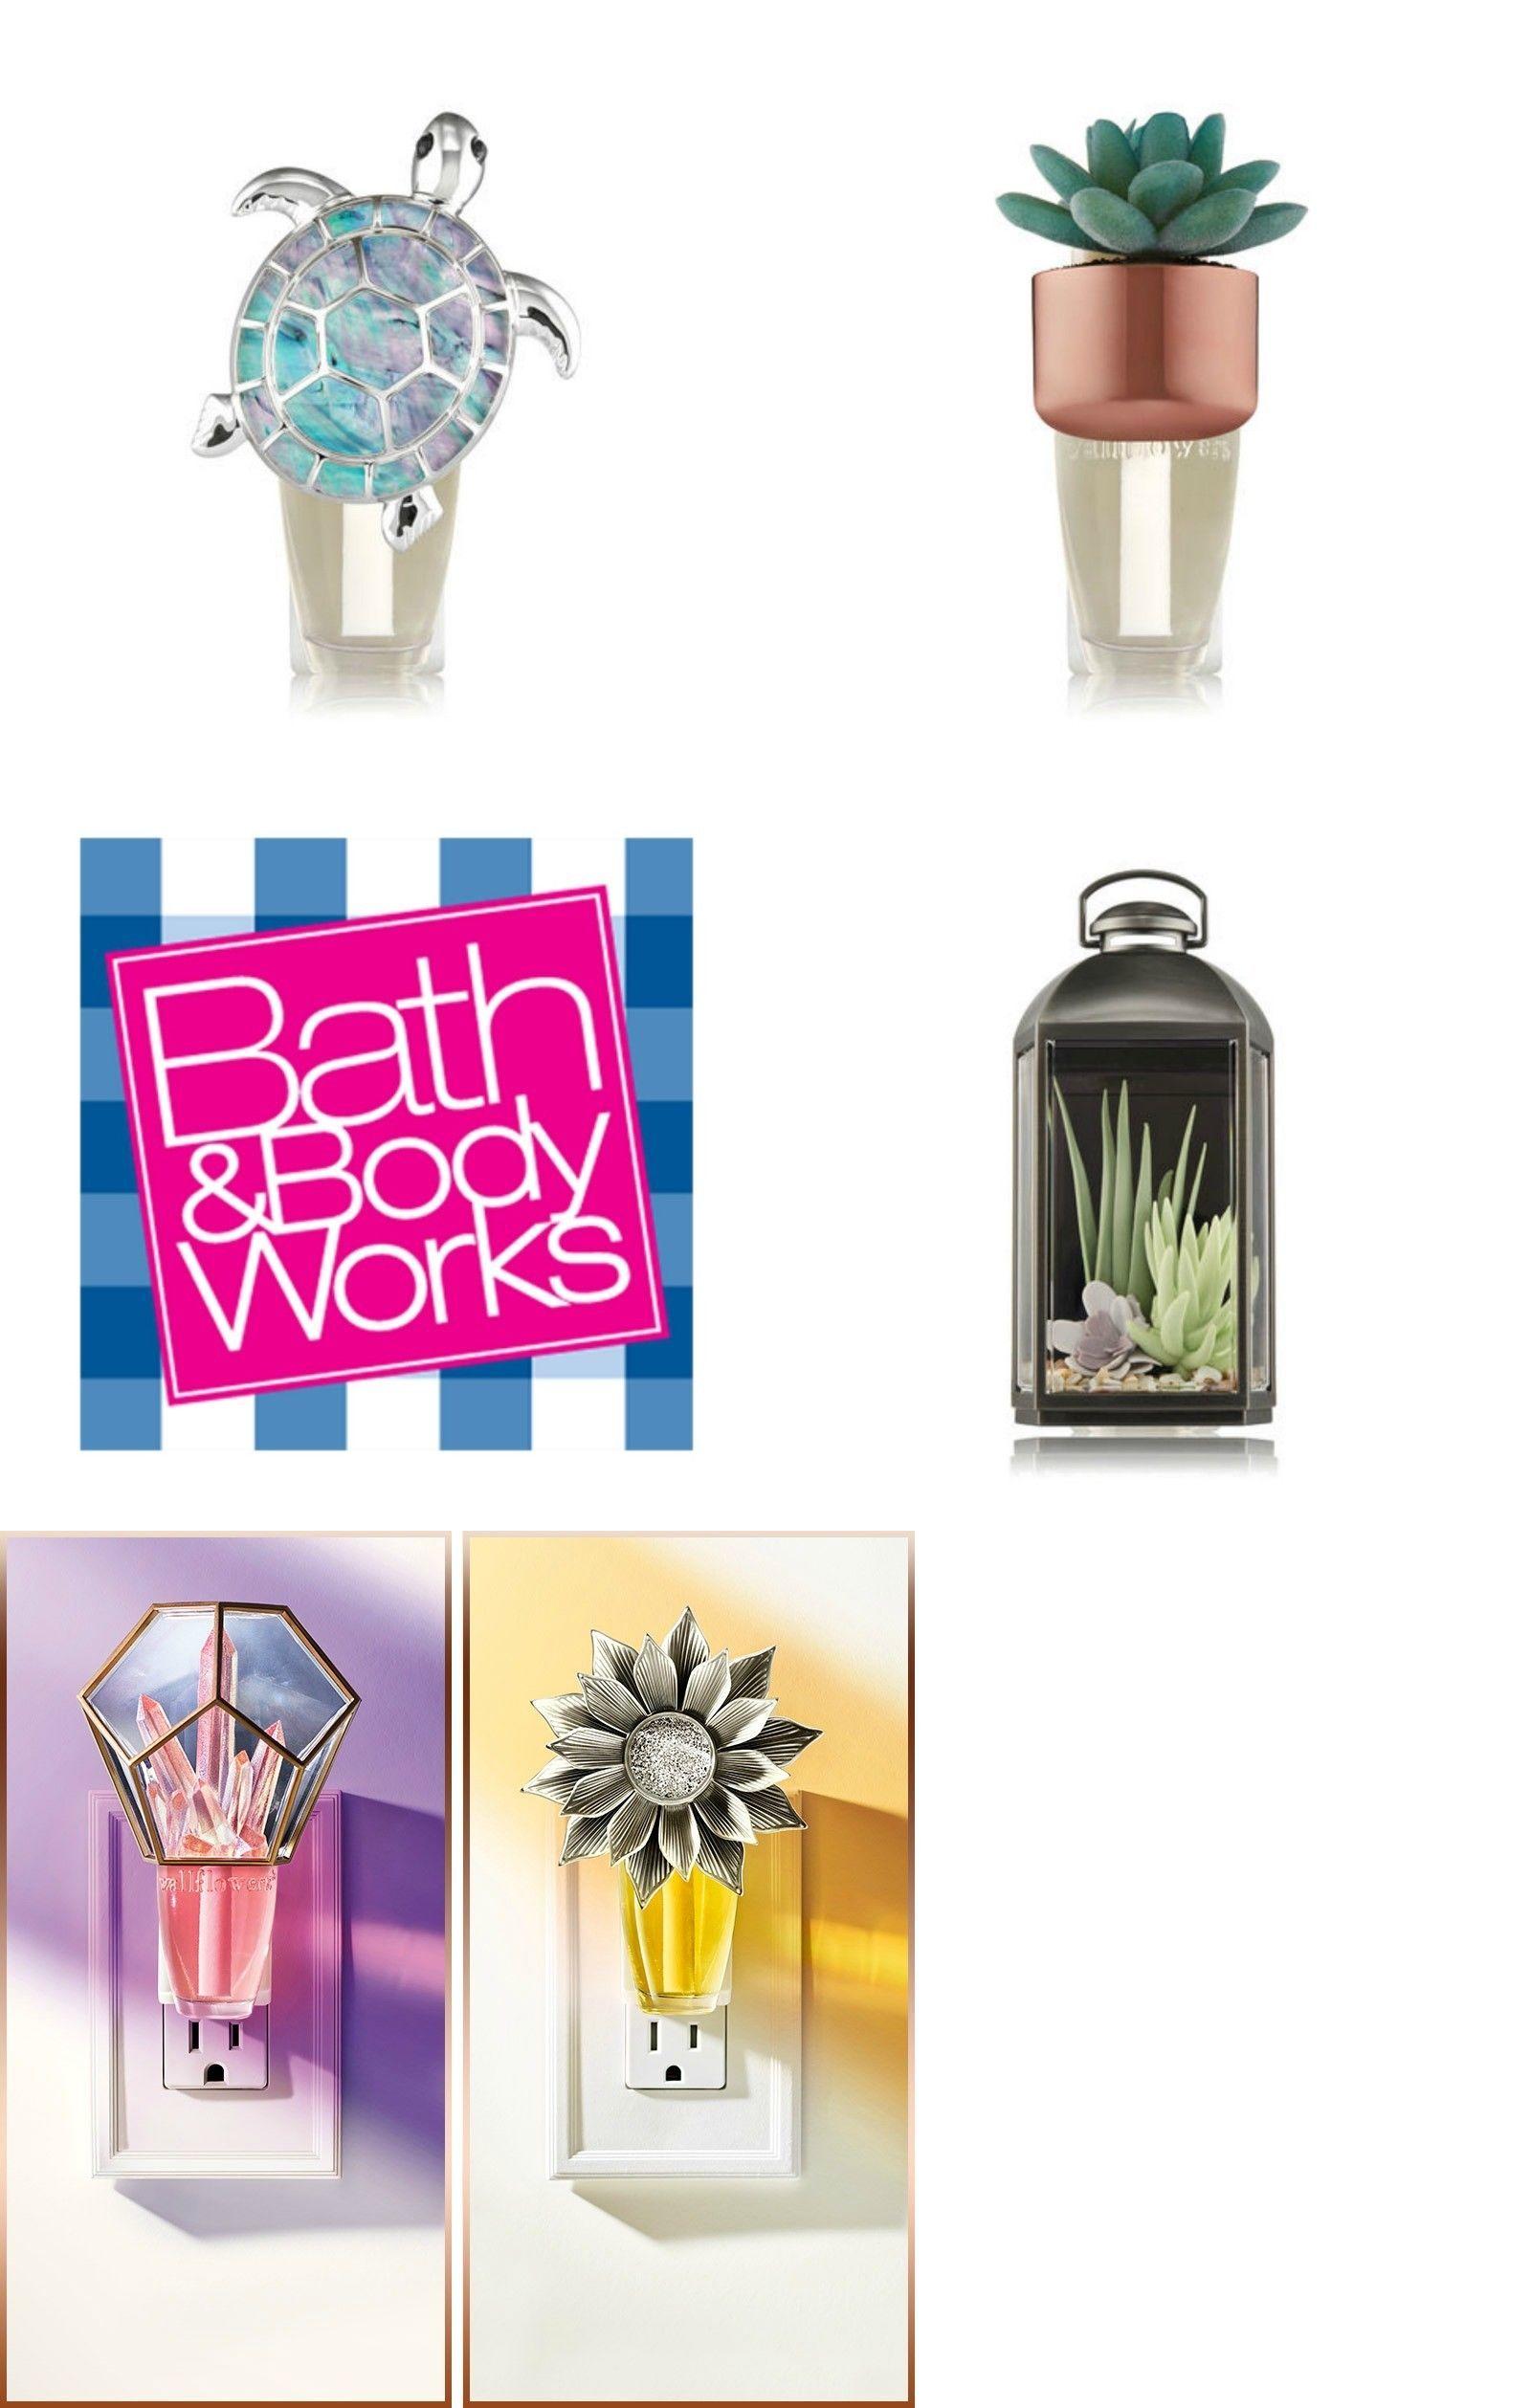 Bath Body Works Wallflowers Fragrance Plug Diffuser Many Retired To Choose From Ebay Bath And Body Works Bath And Body Diffuser